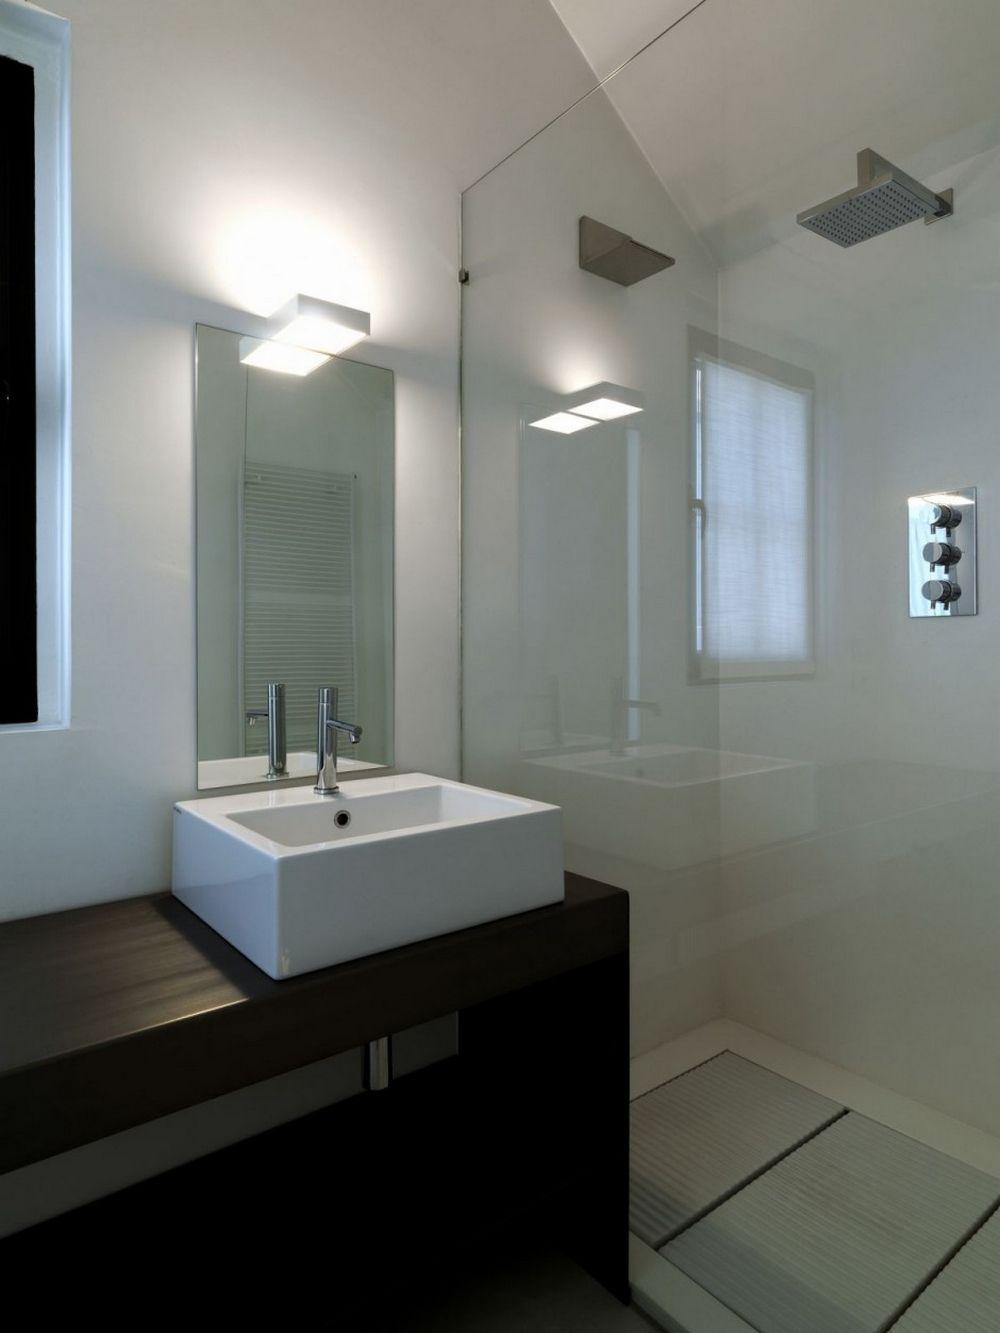 Comforter sets urban style interior design wallpaper for Urban bathroom designs